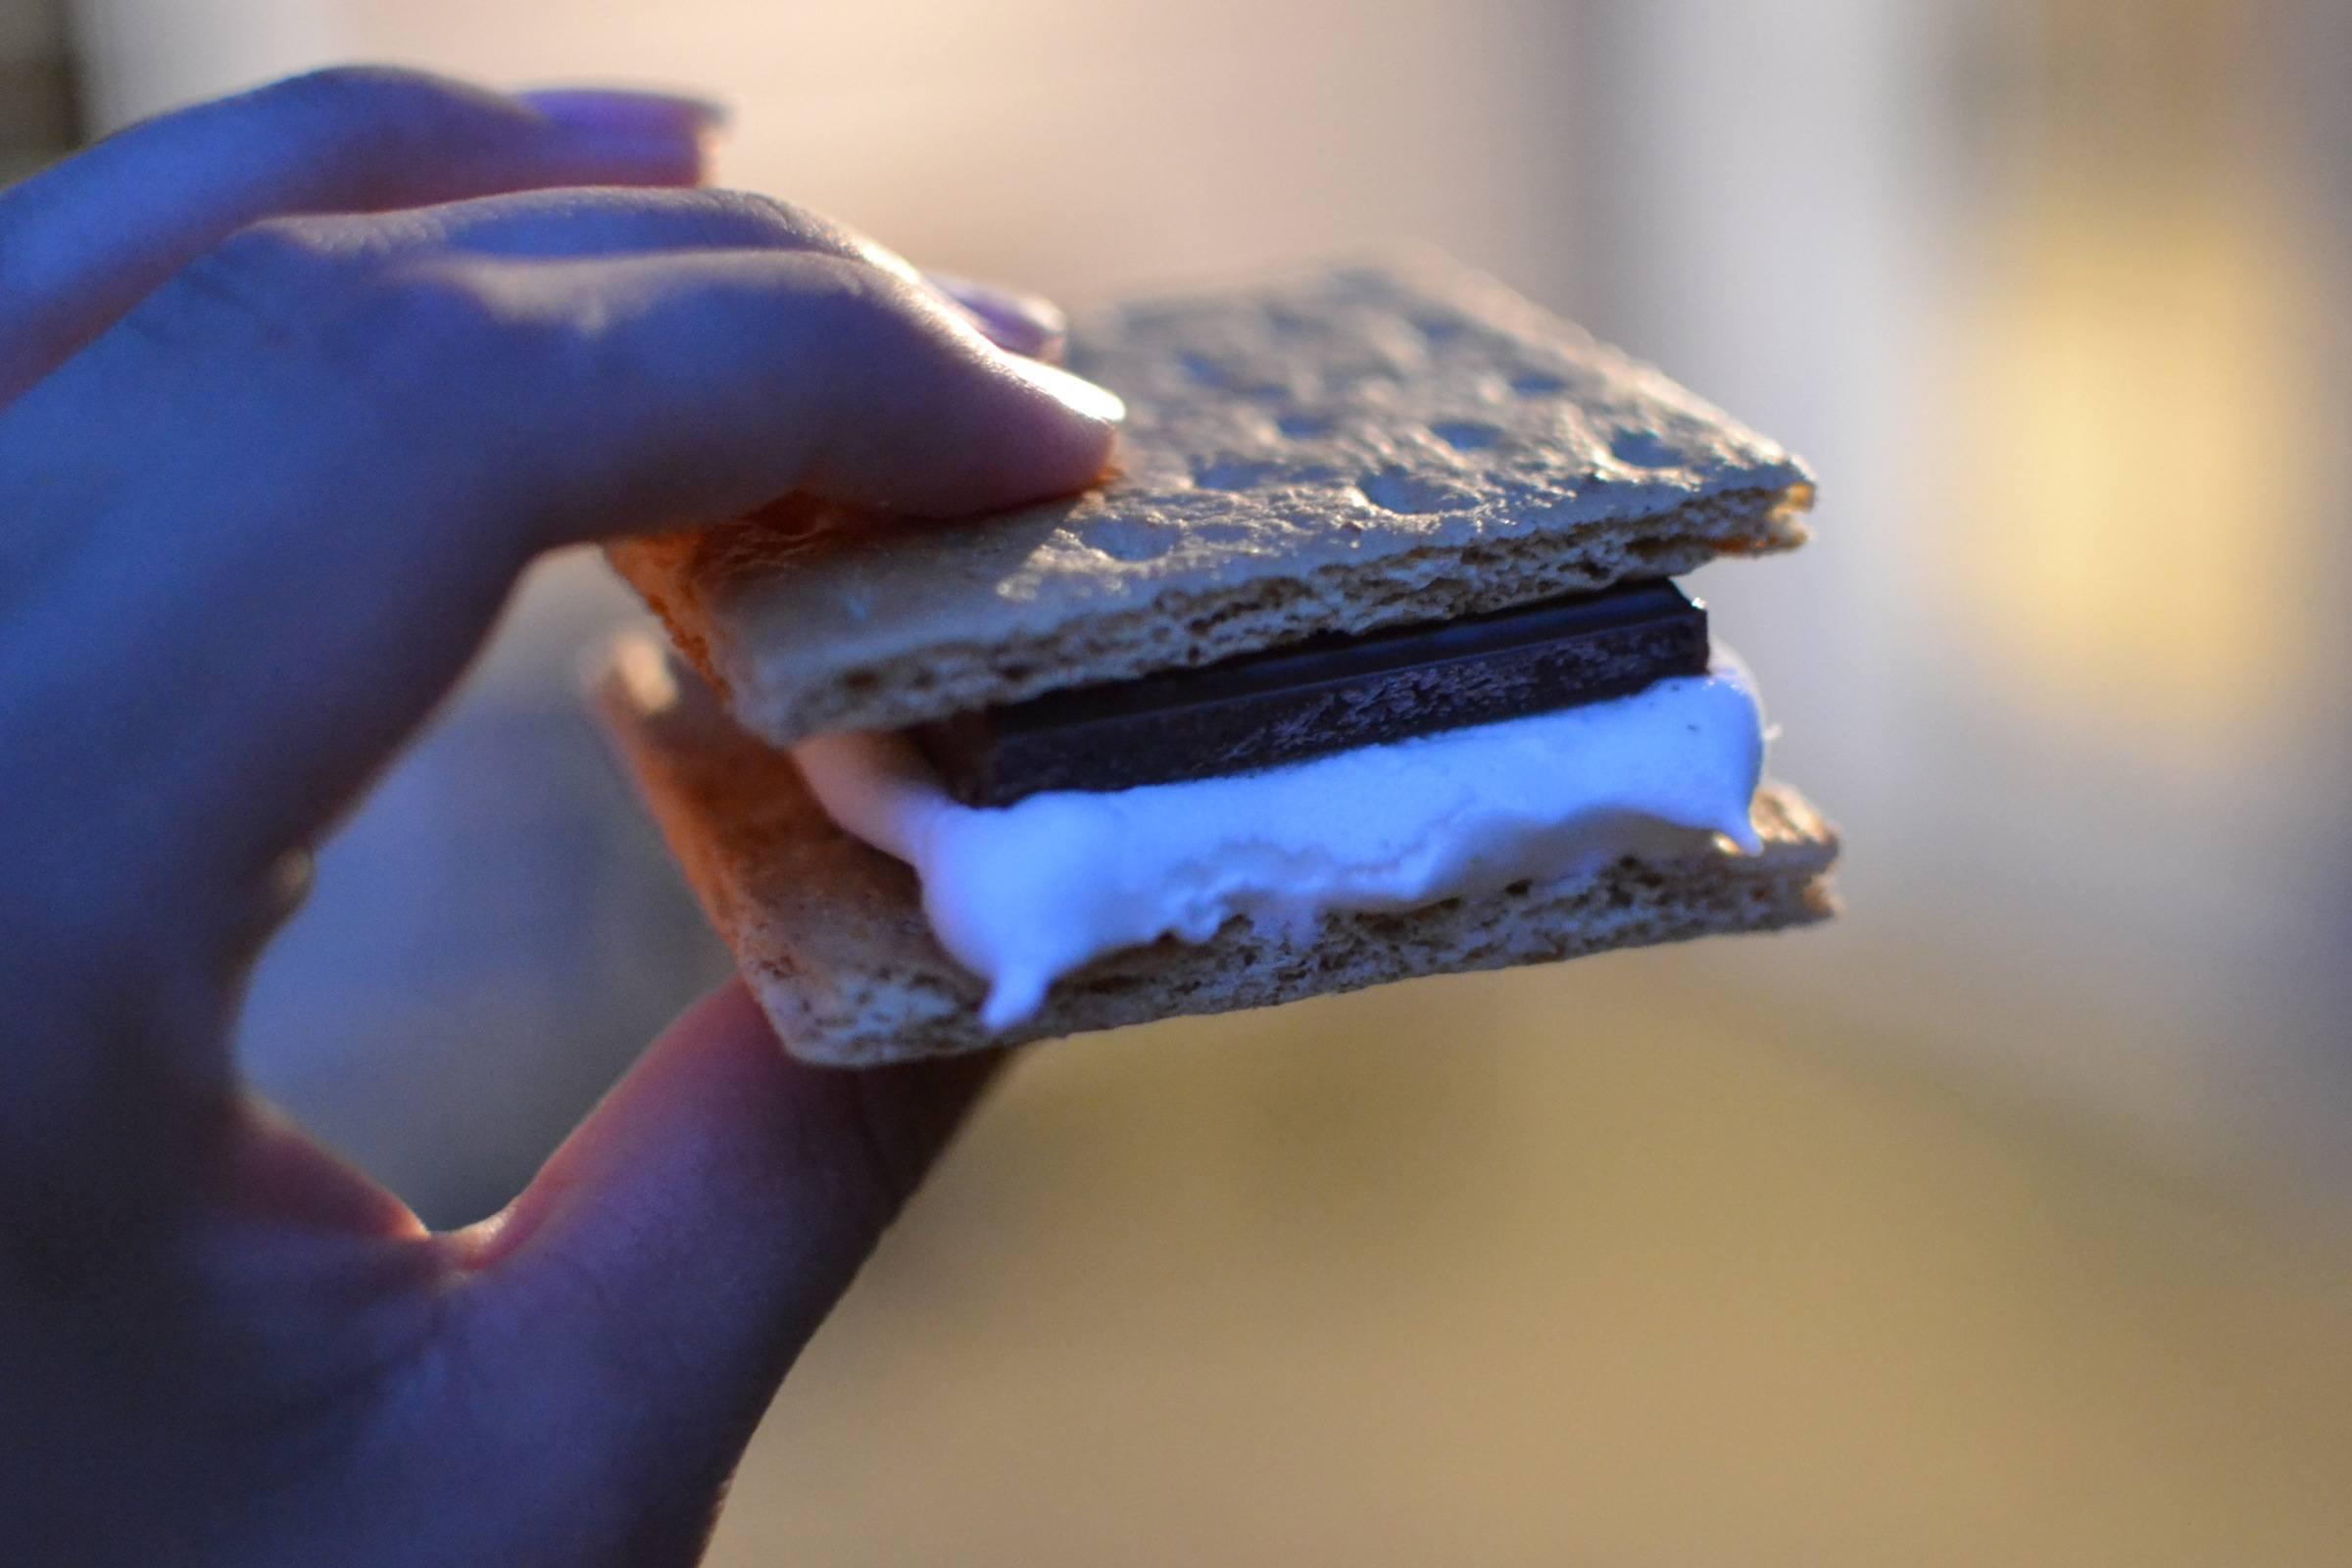 I should be a food photographer...